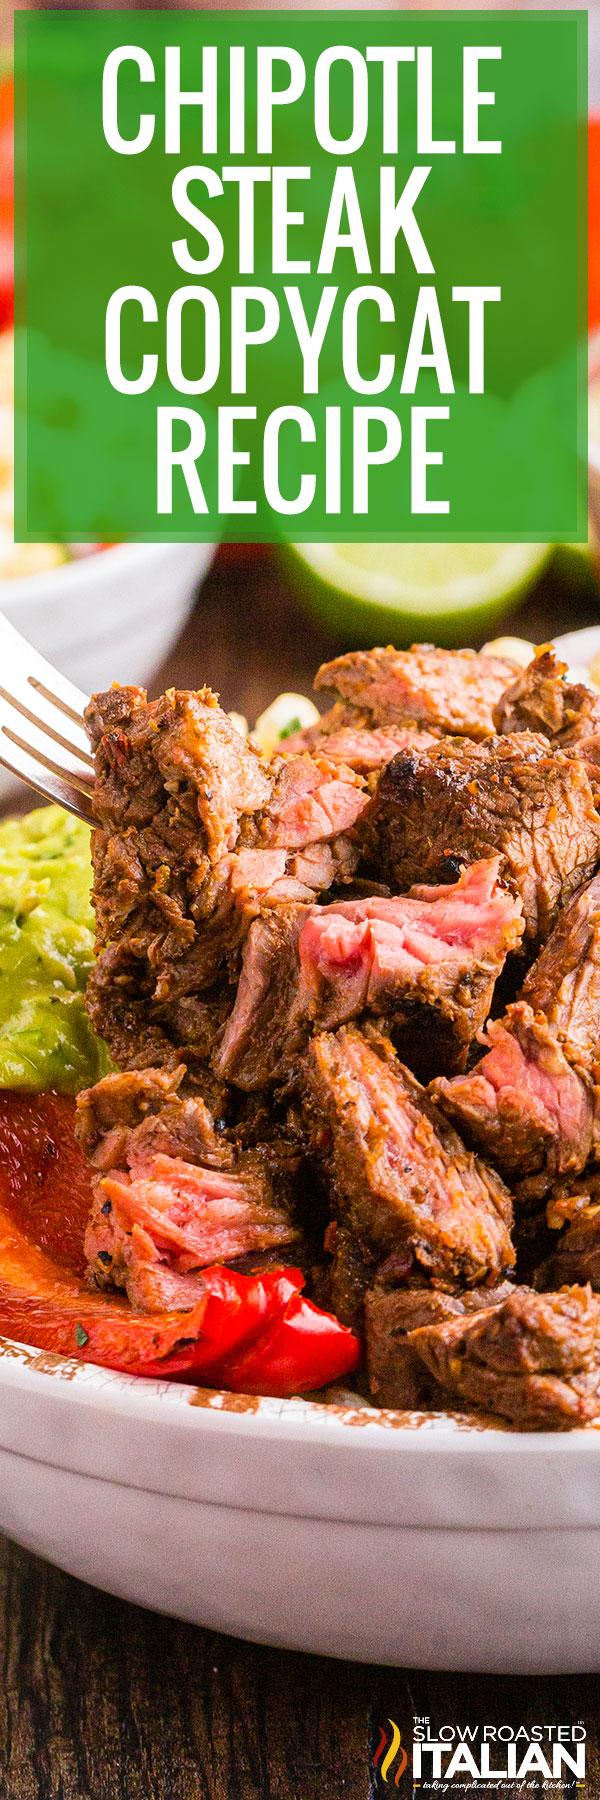 Chipotle Steak Copycat Recipe Closeup